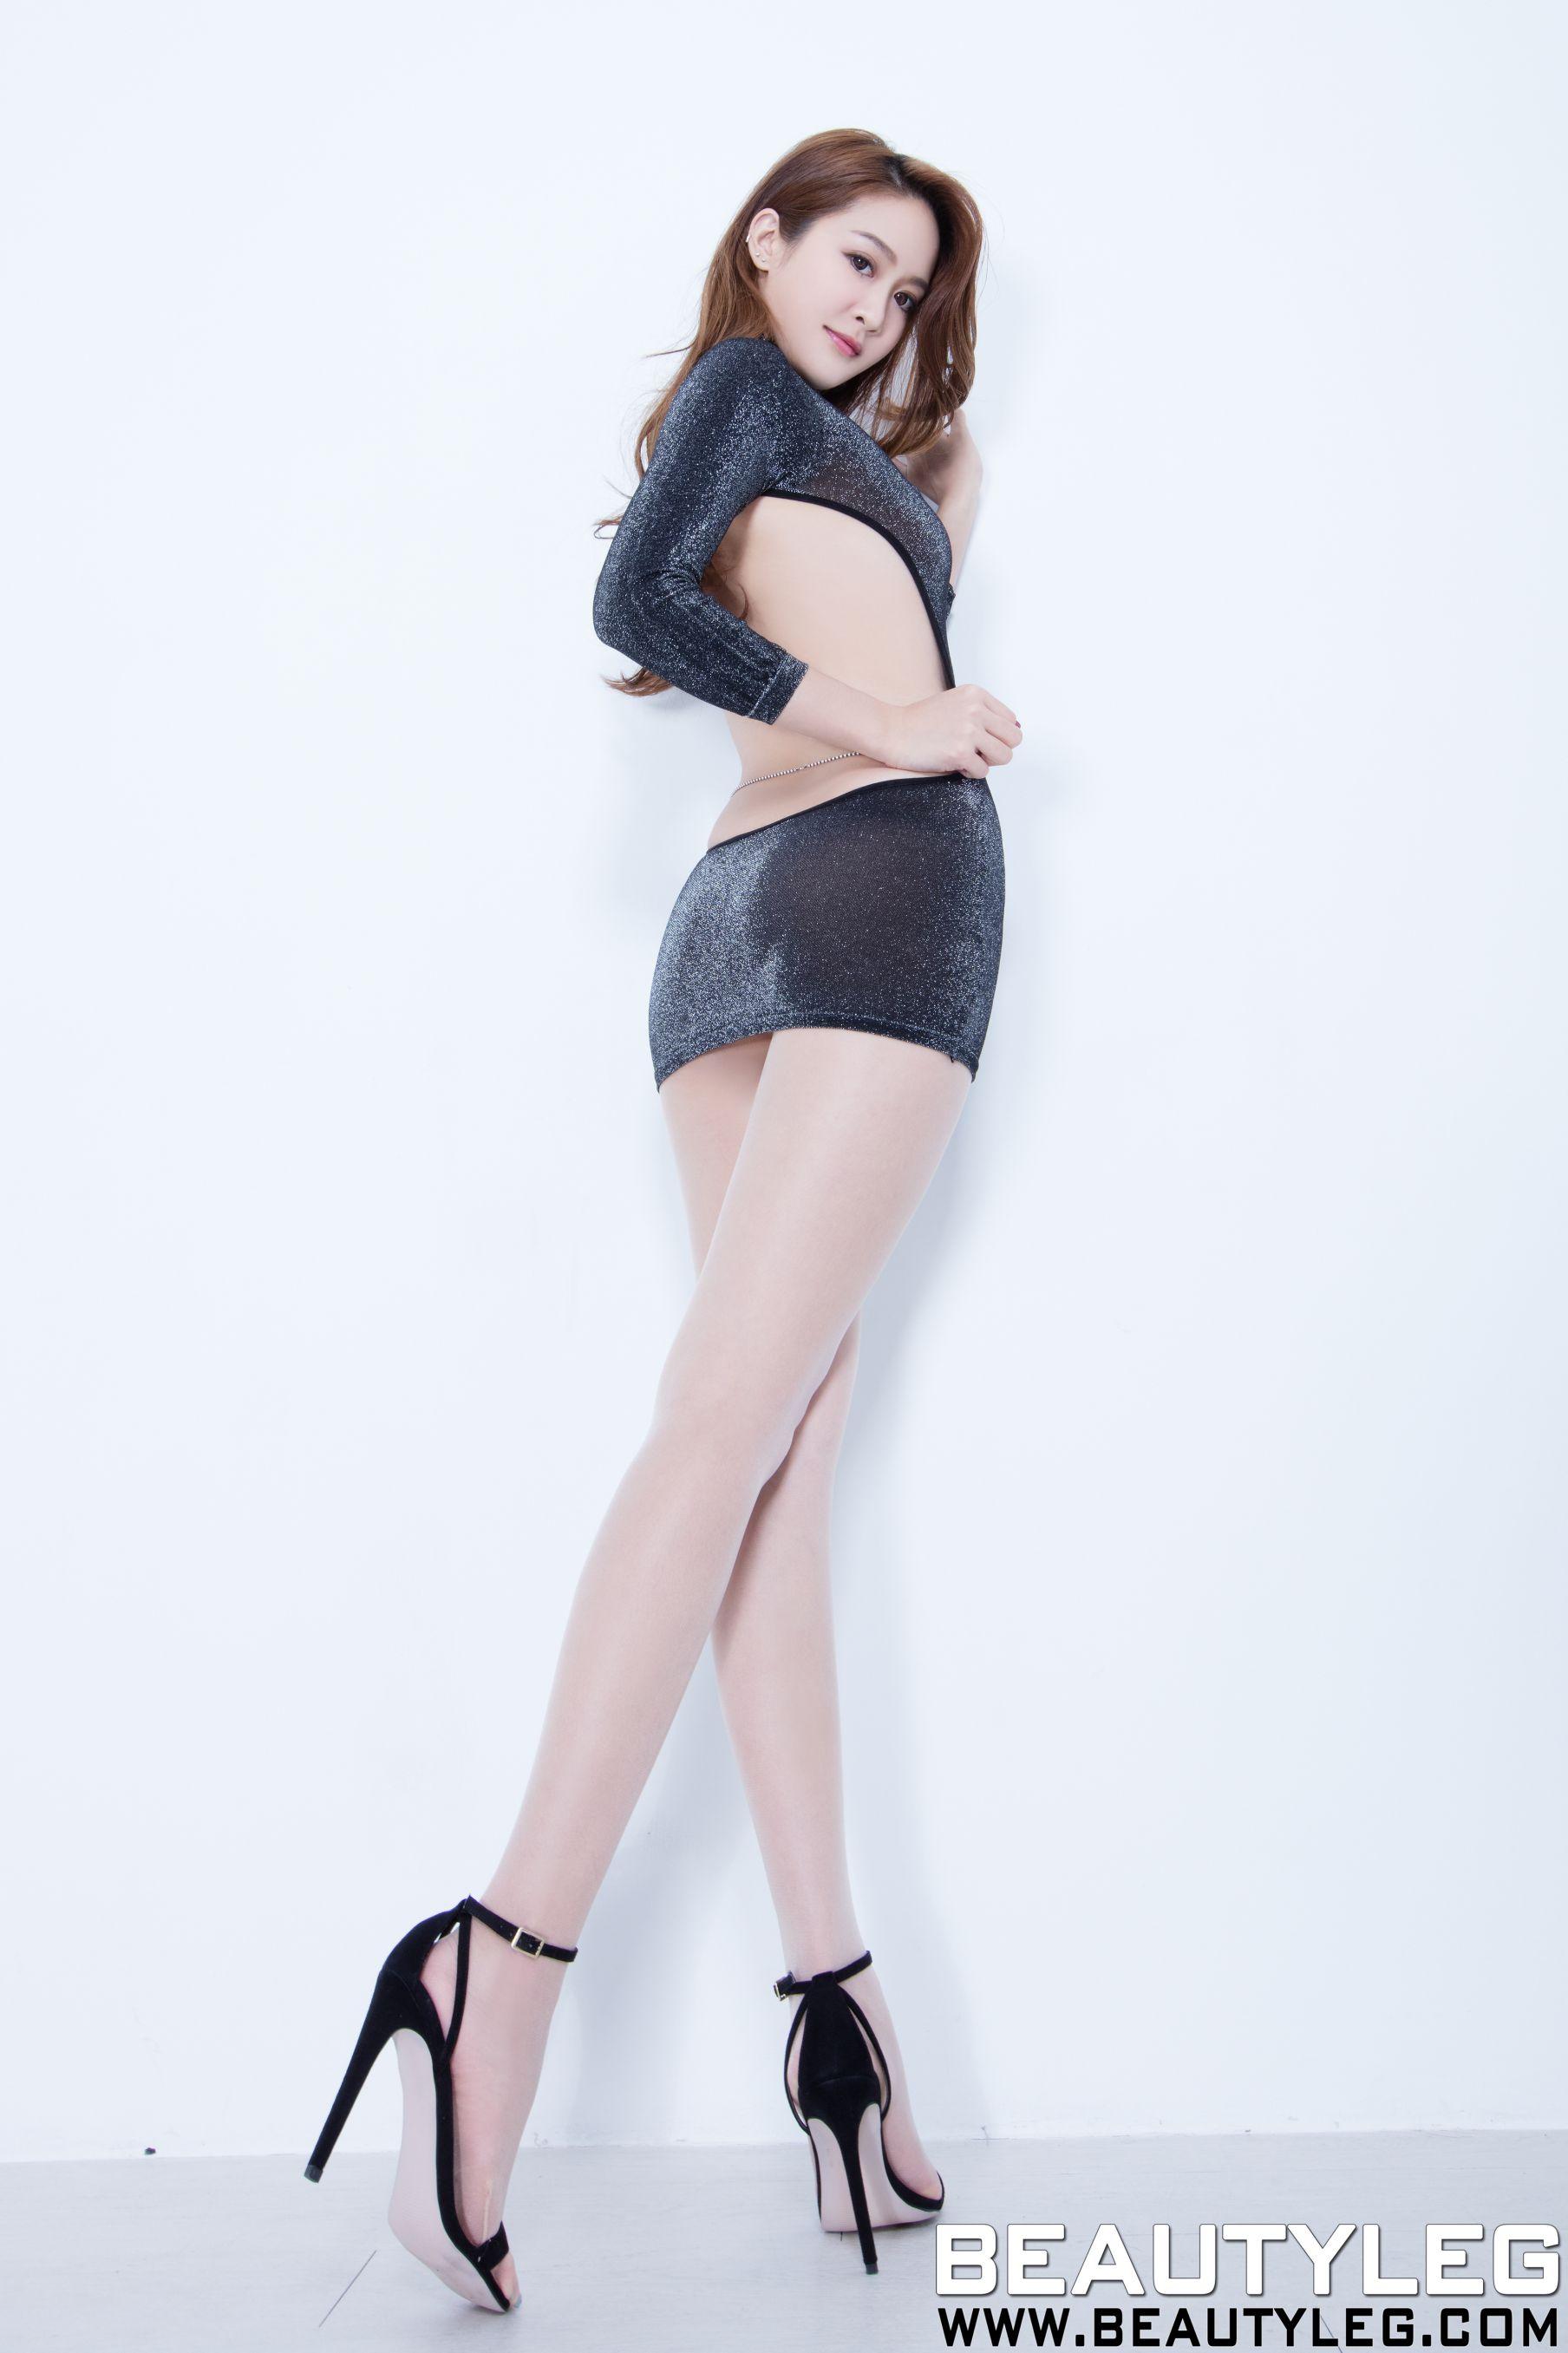 VOL.1083 [Beautyleg]高跟美腿:康凯乐(腿模Kaylar)高品质写真套图(51P)